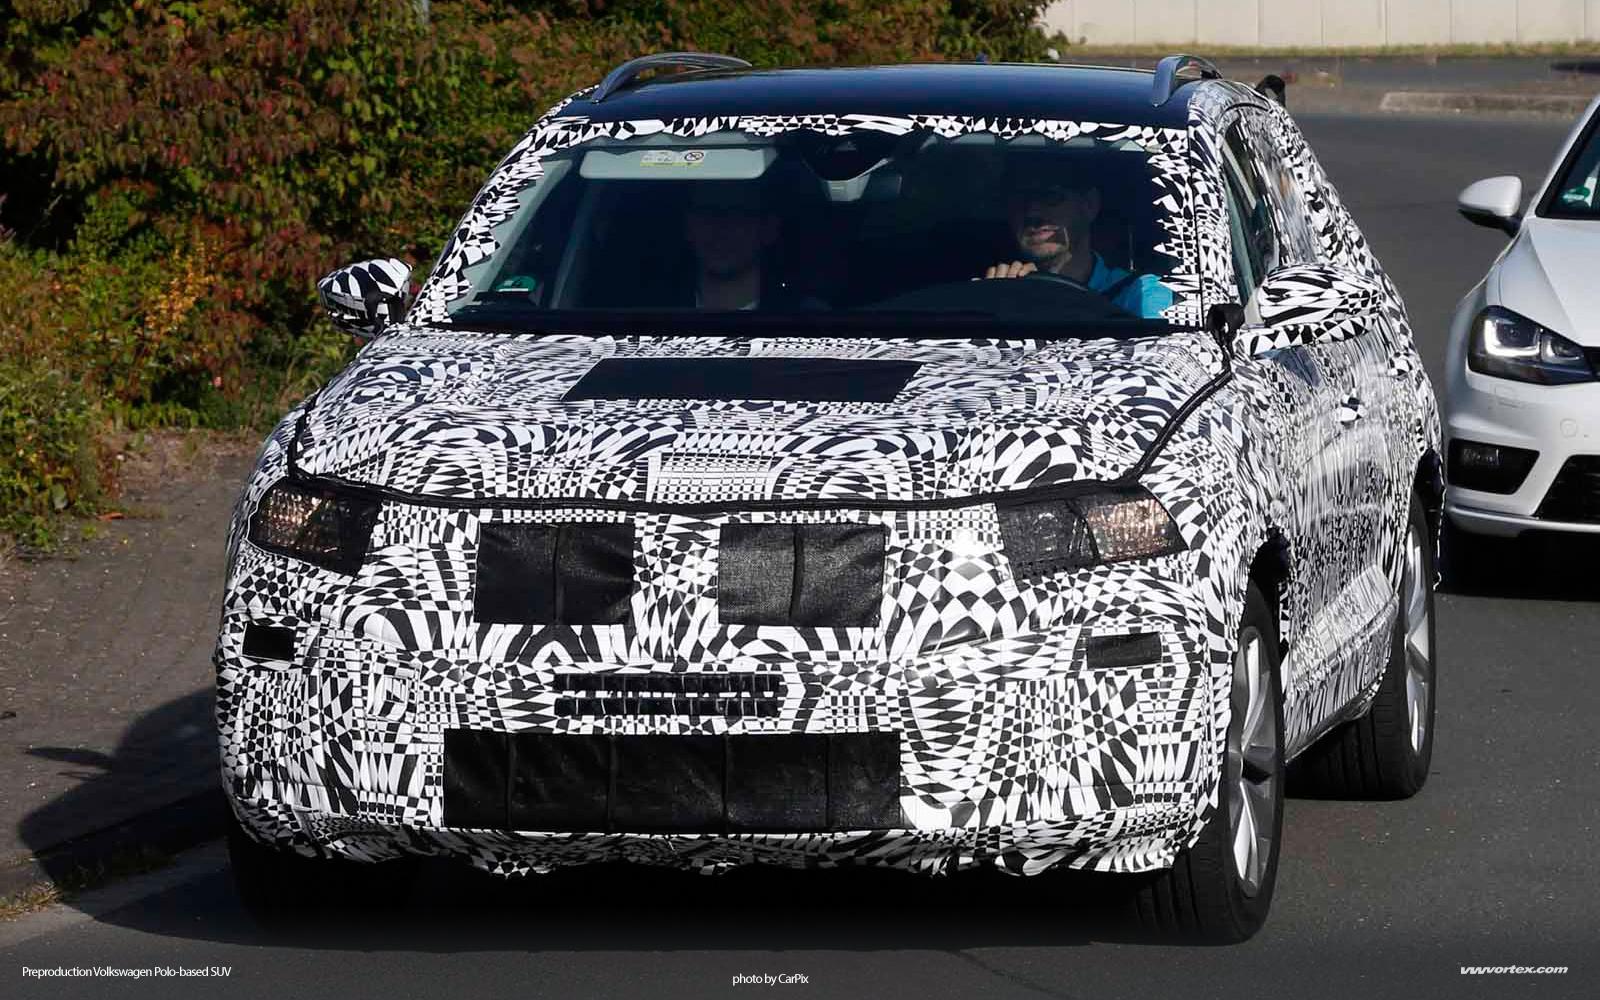 2015 VLN Audi R8 LMS test and setup session 963 600x300 photo